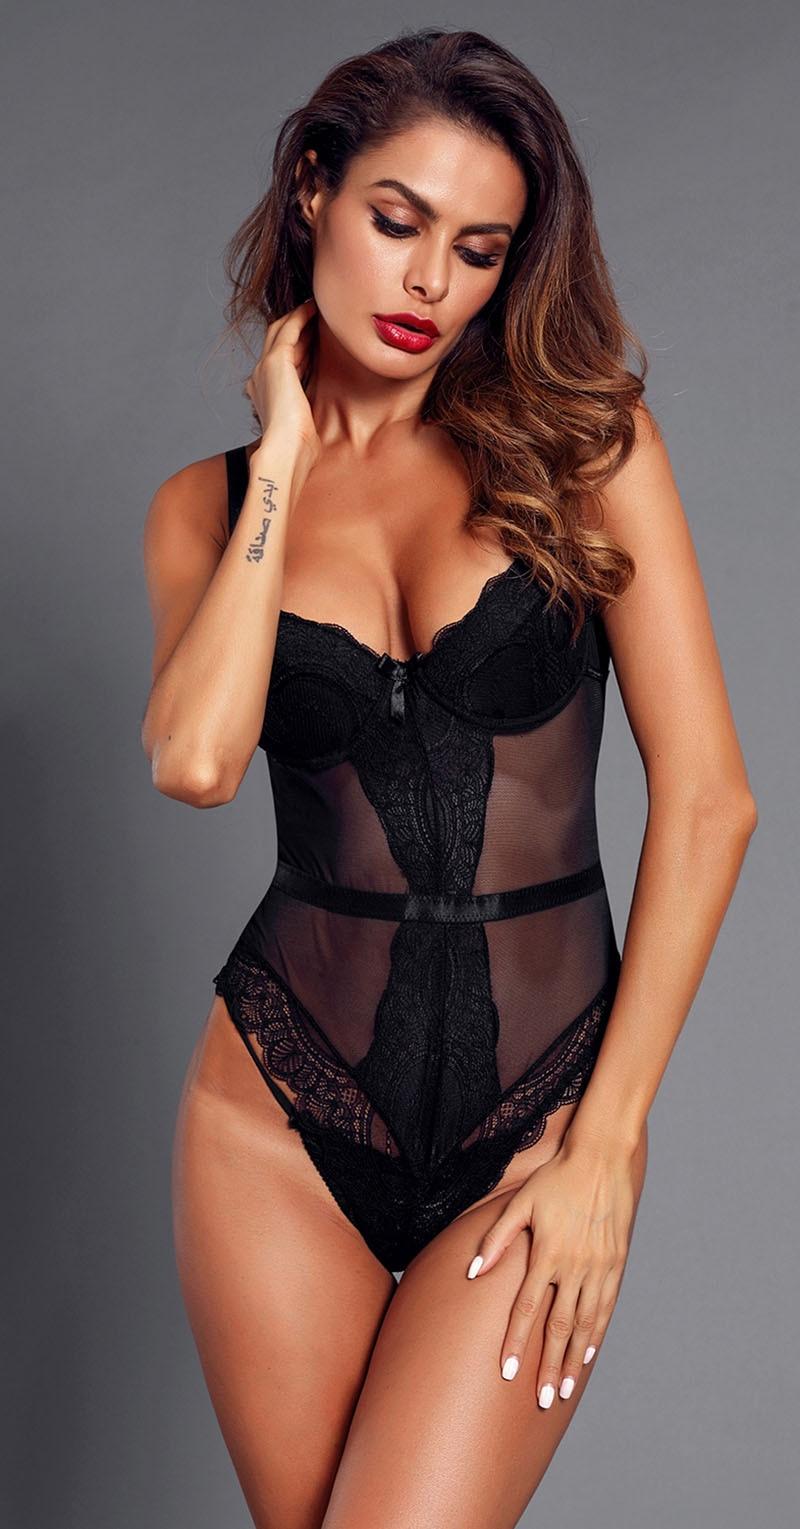 Black-Sheer-Lace-Spaghetti-Strap-Bodysuit-LC32259-2-3